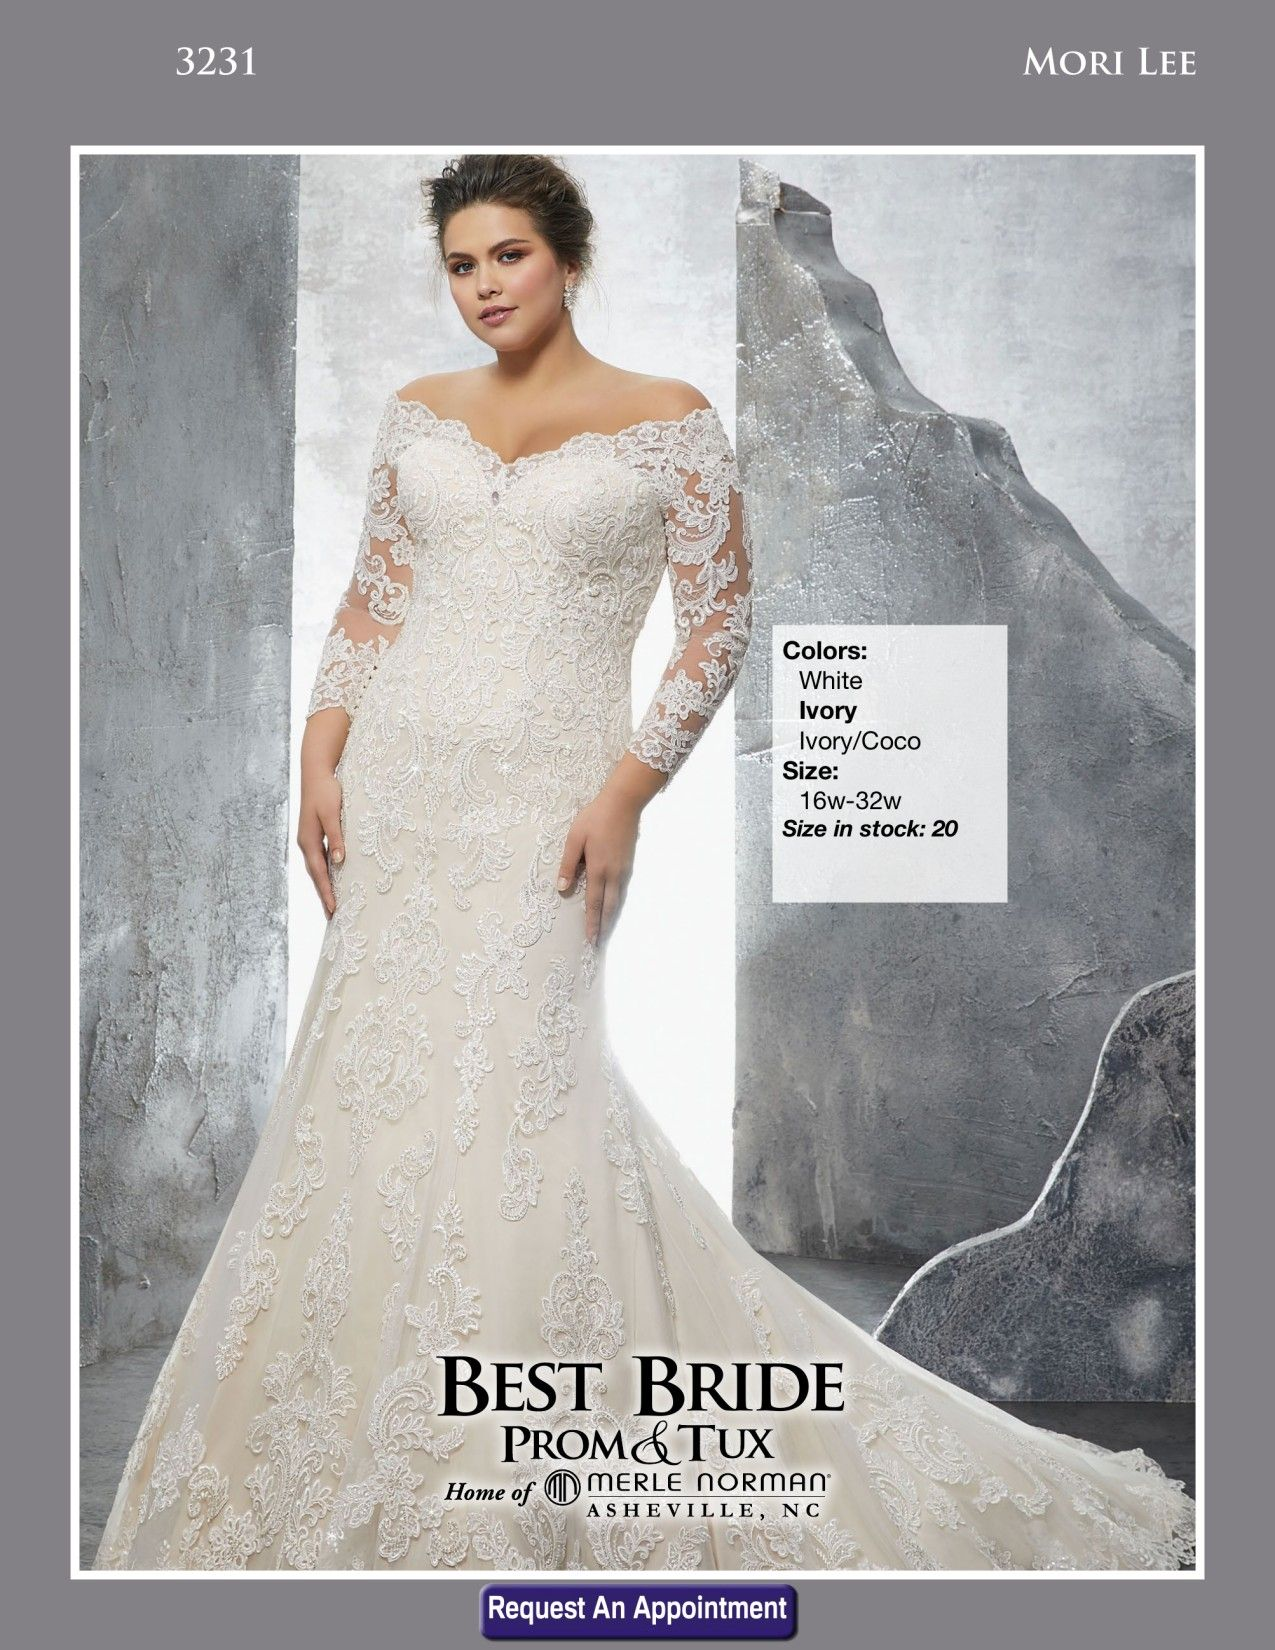 Best wedding dress for size 20  Pin by Best Bride Prom u Tux on Plus Size Bridal Dresses  Pinterest